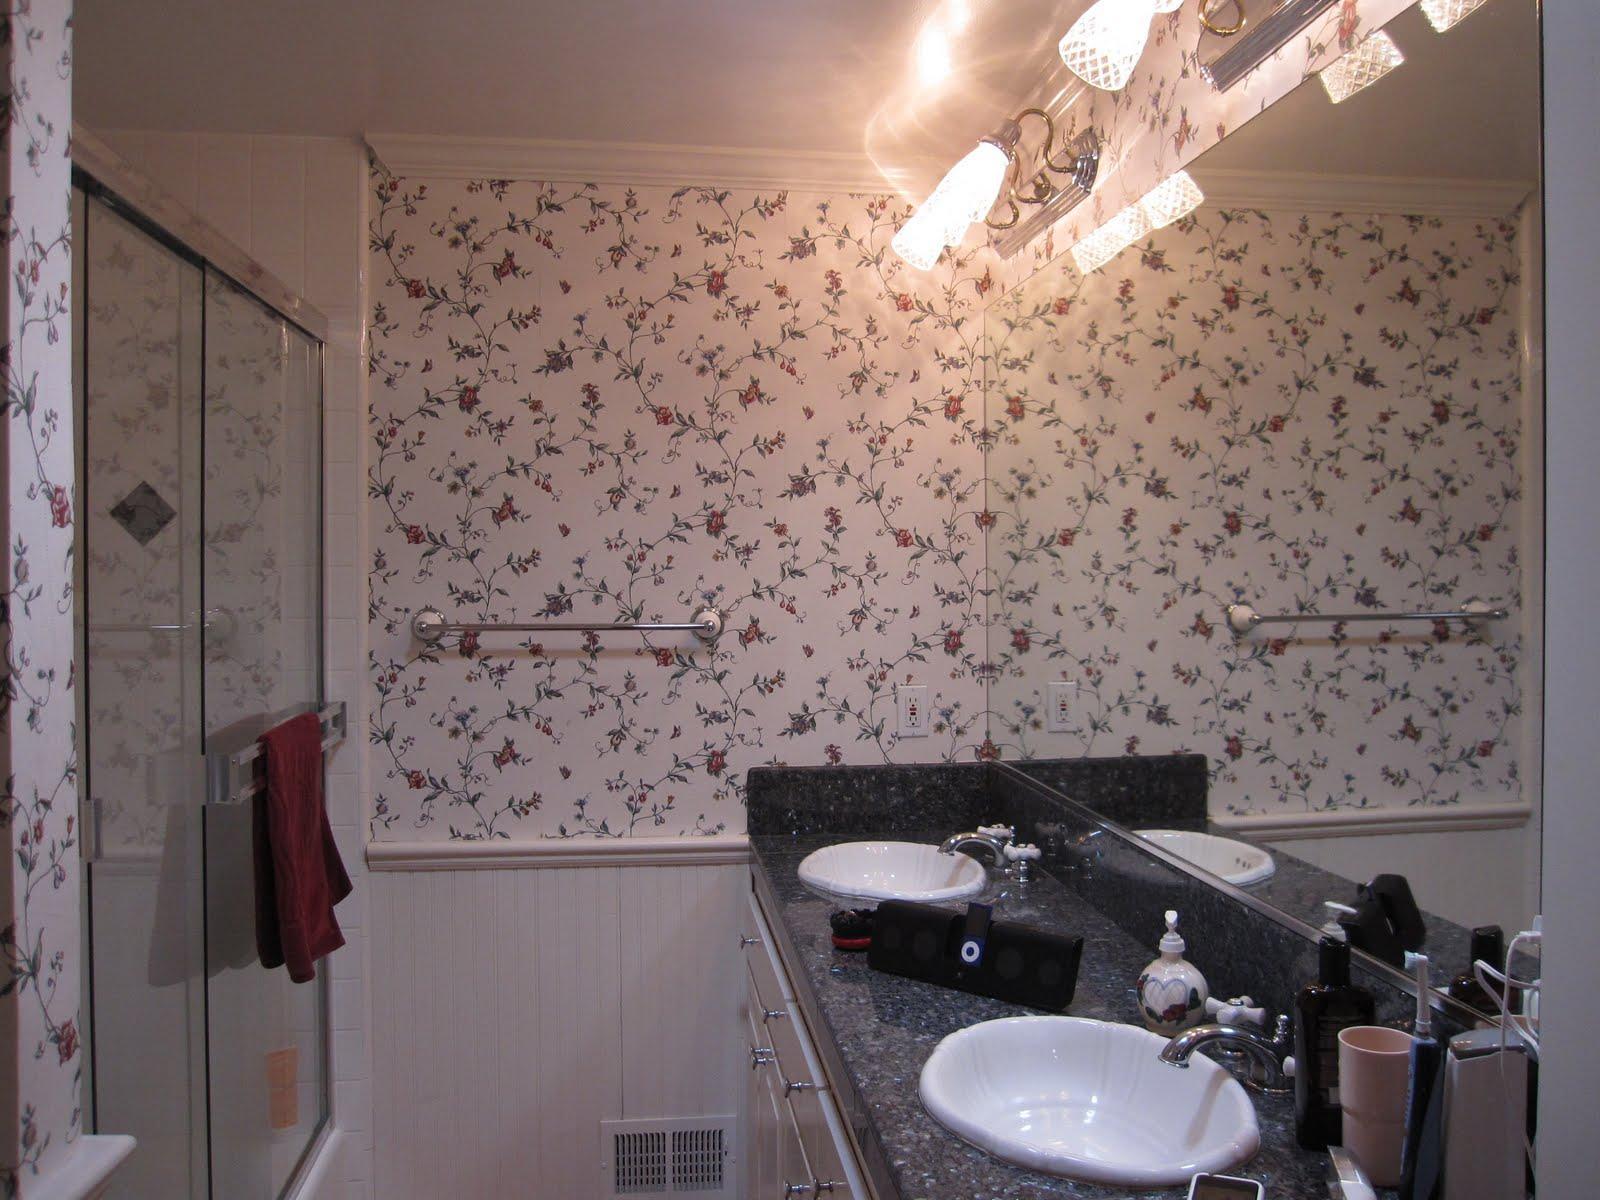 Wallpaper Border Bathrooms